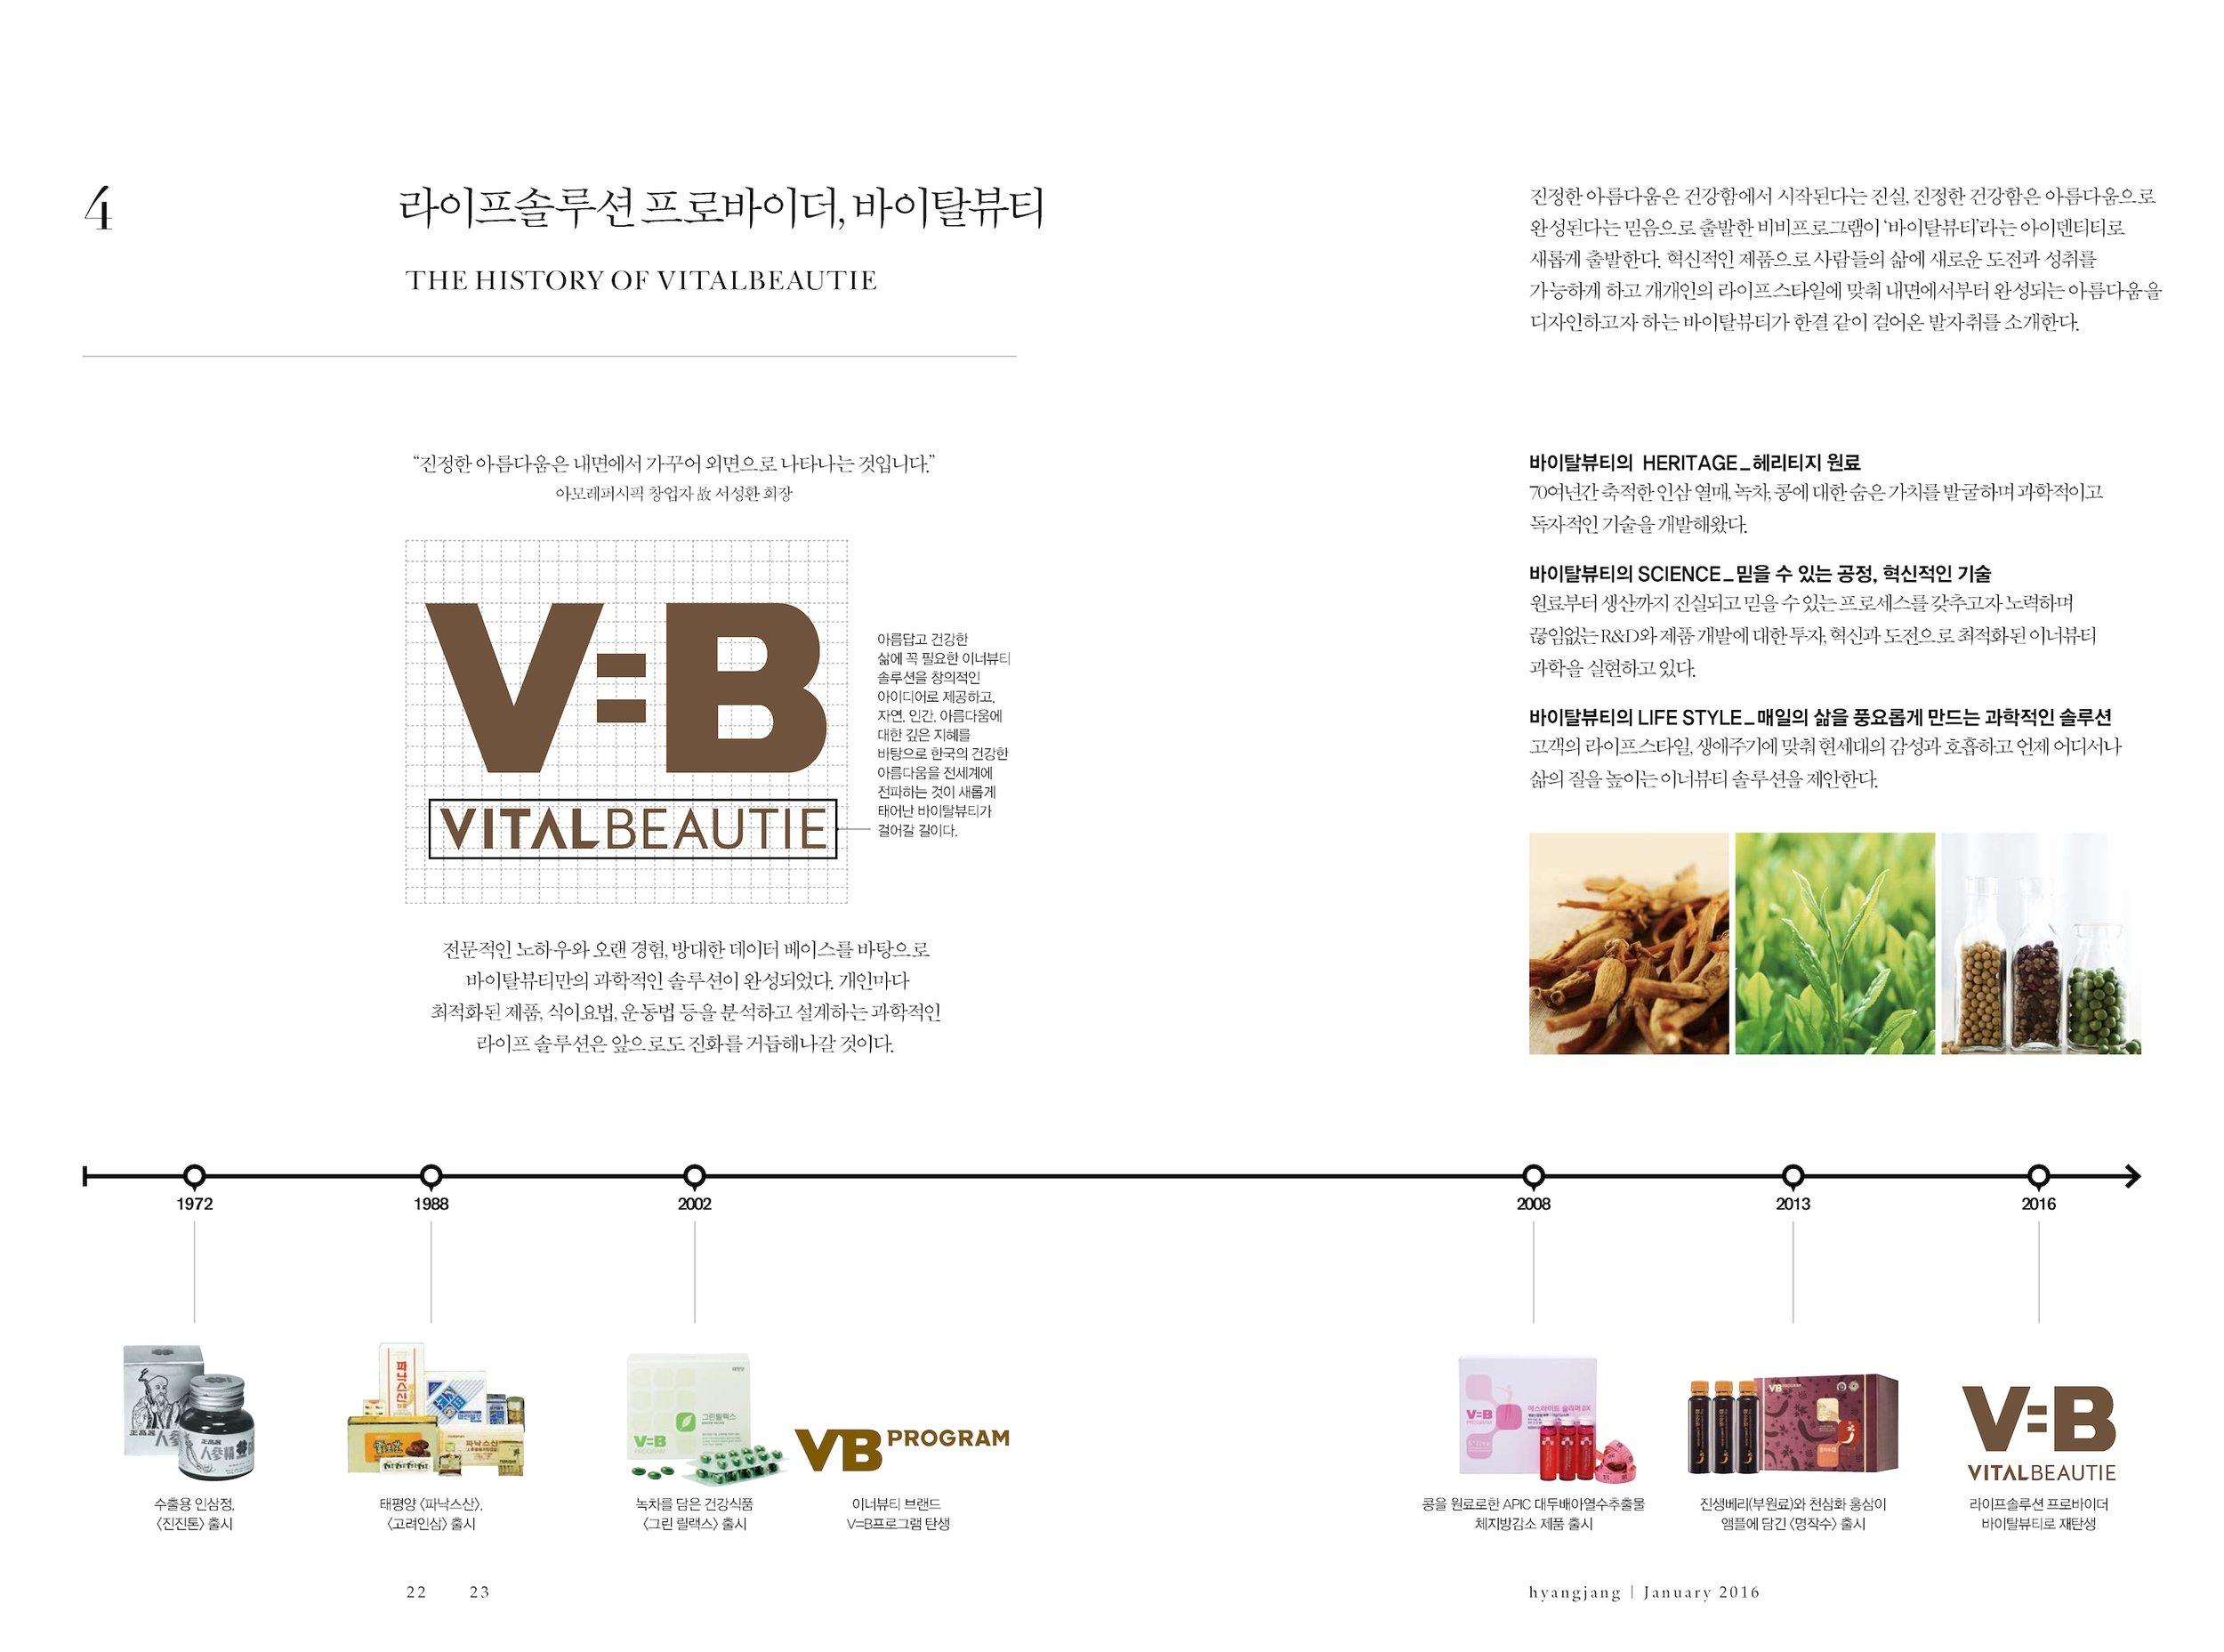 hyangjang-201601_페이지_11.jpeg